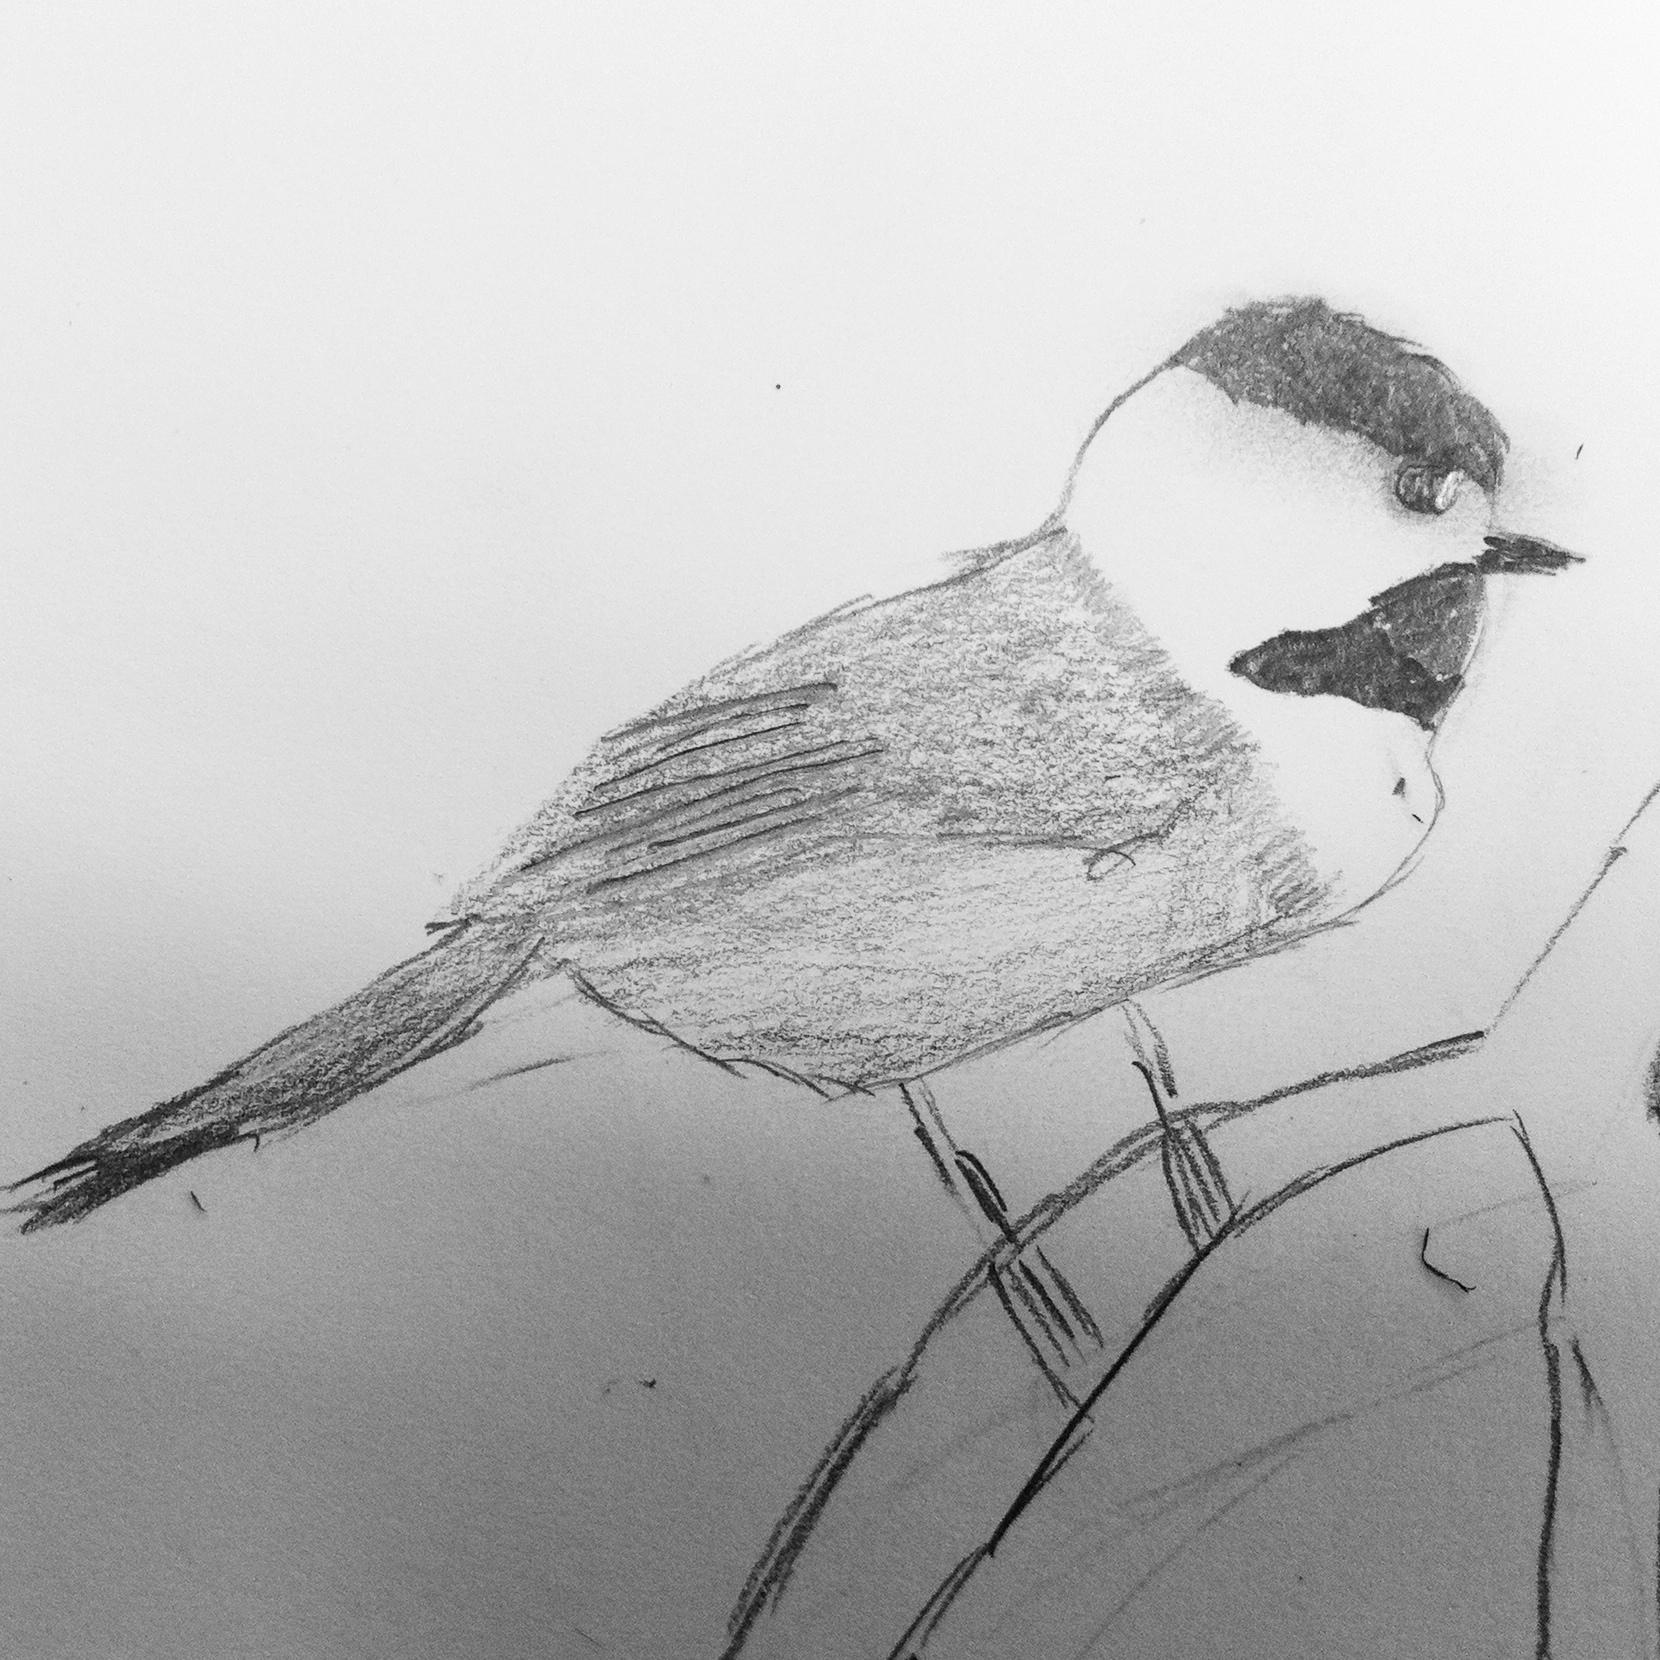 Mike's sketch of the Carolina chickadee.